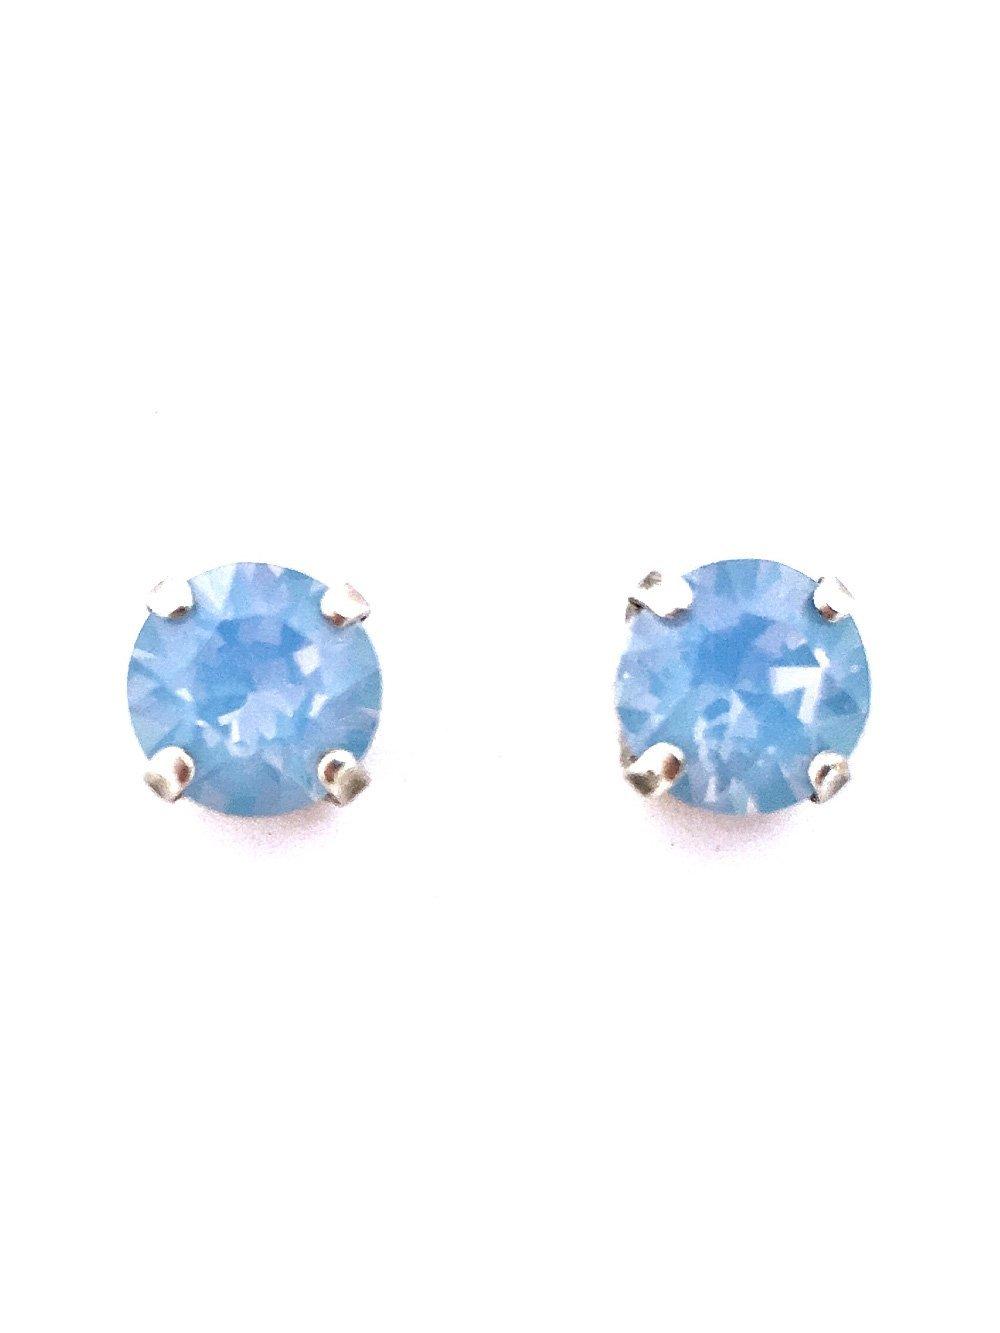 e4776f84be13 Amazon.com  Swarovski Crystal Rhinestone Air Blue Opal - 39ss Post Stud  Earrings  Handmade